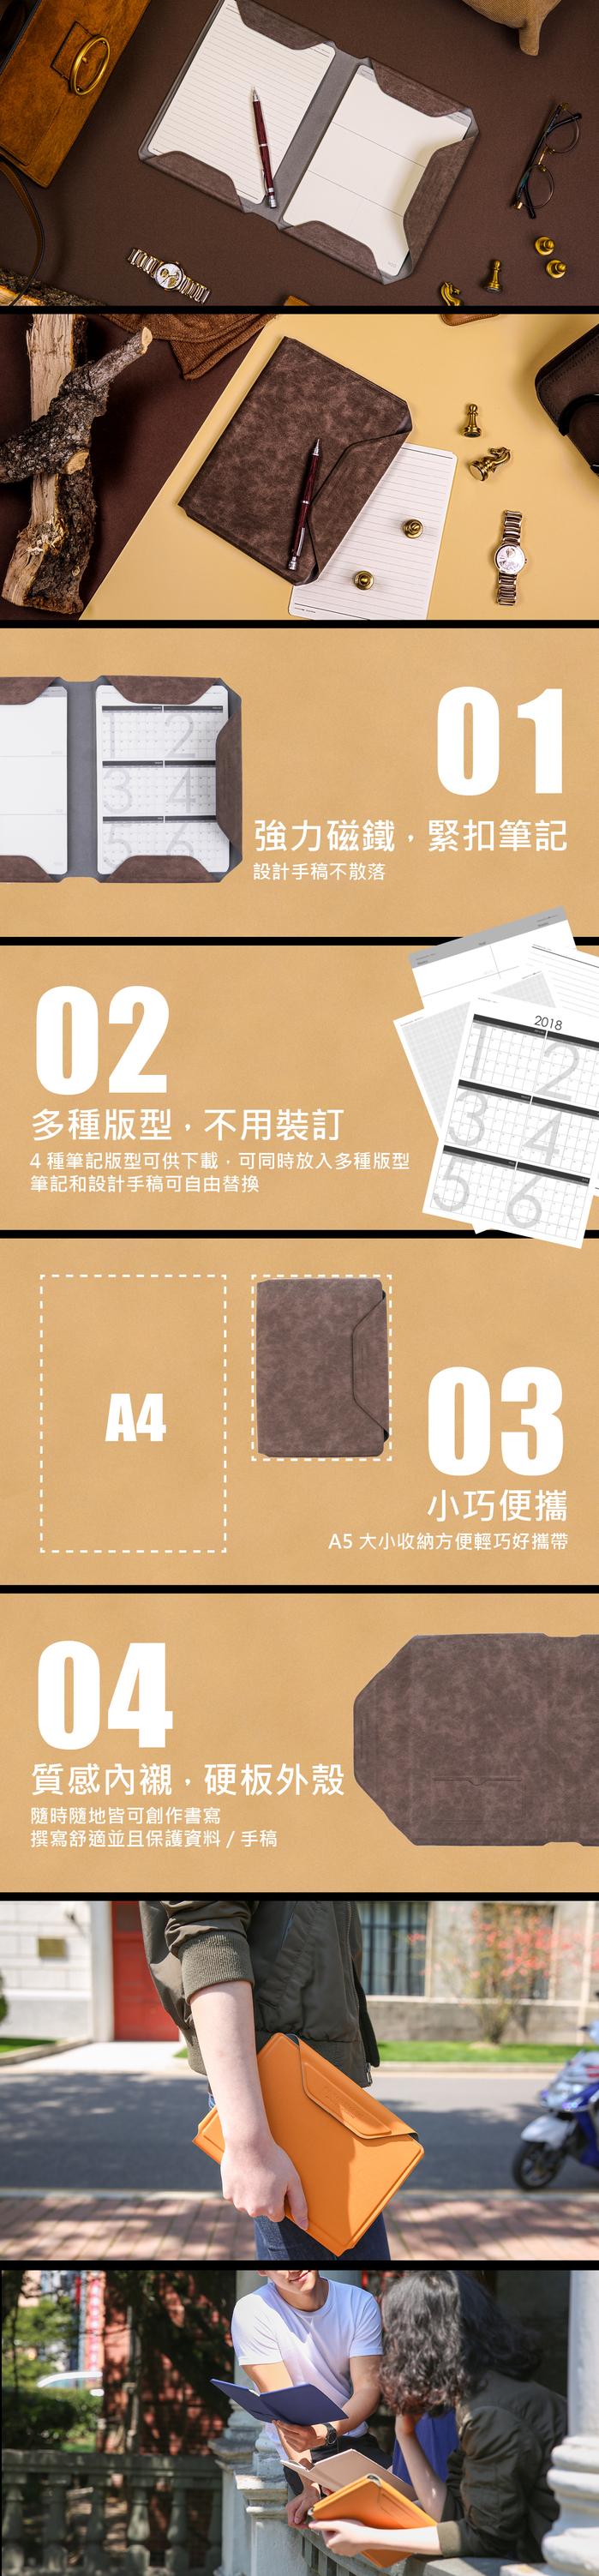 (複製)Allocacoc | NoteBook Modular 迷你百搭筆記本 - 黃色